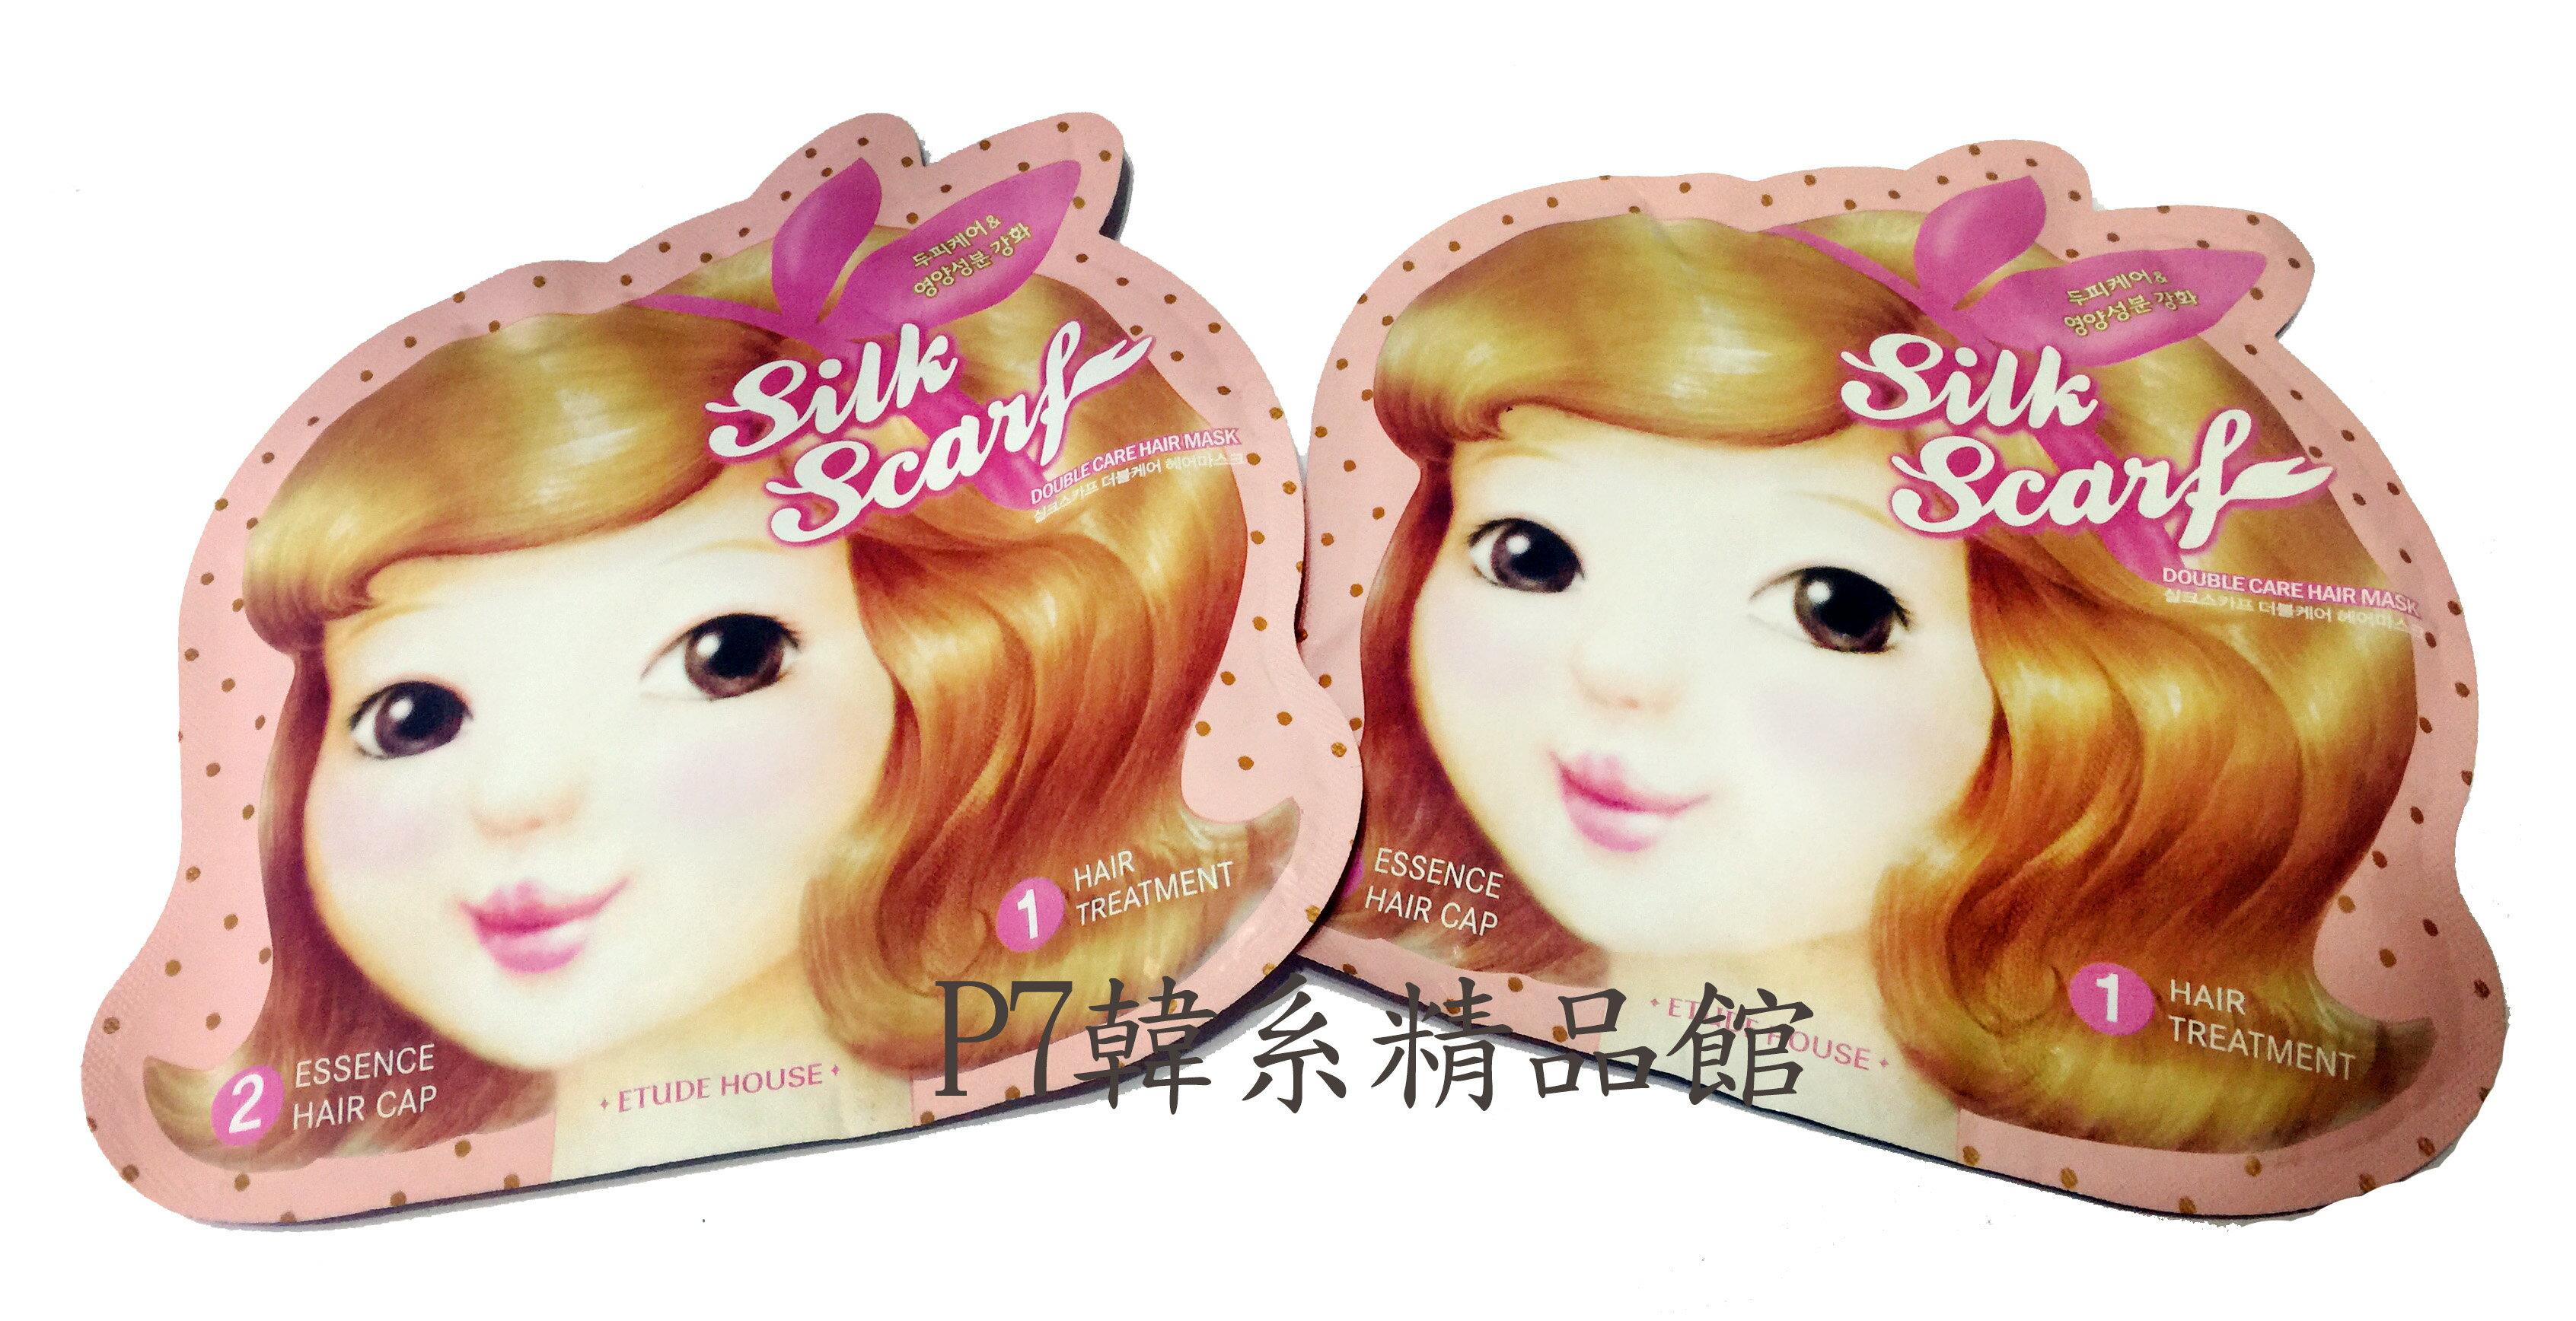 ETUDE HOUSE愛麗小屋甜心香吻雙重修護寶貝髮膜蠶絲精華修復髮膜shinee代言改善